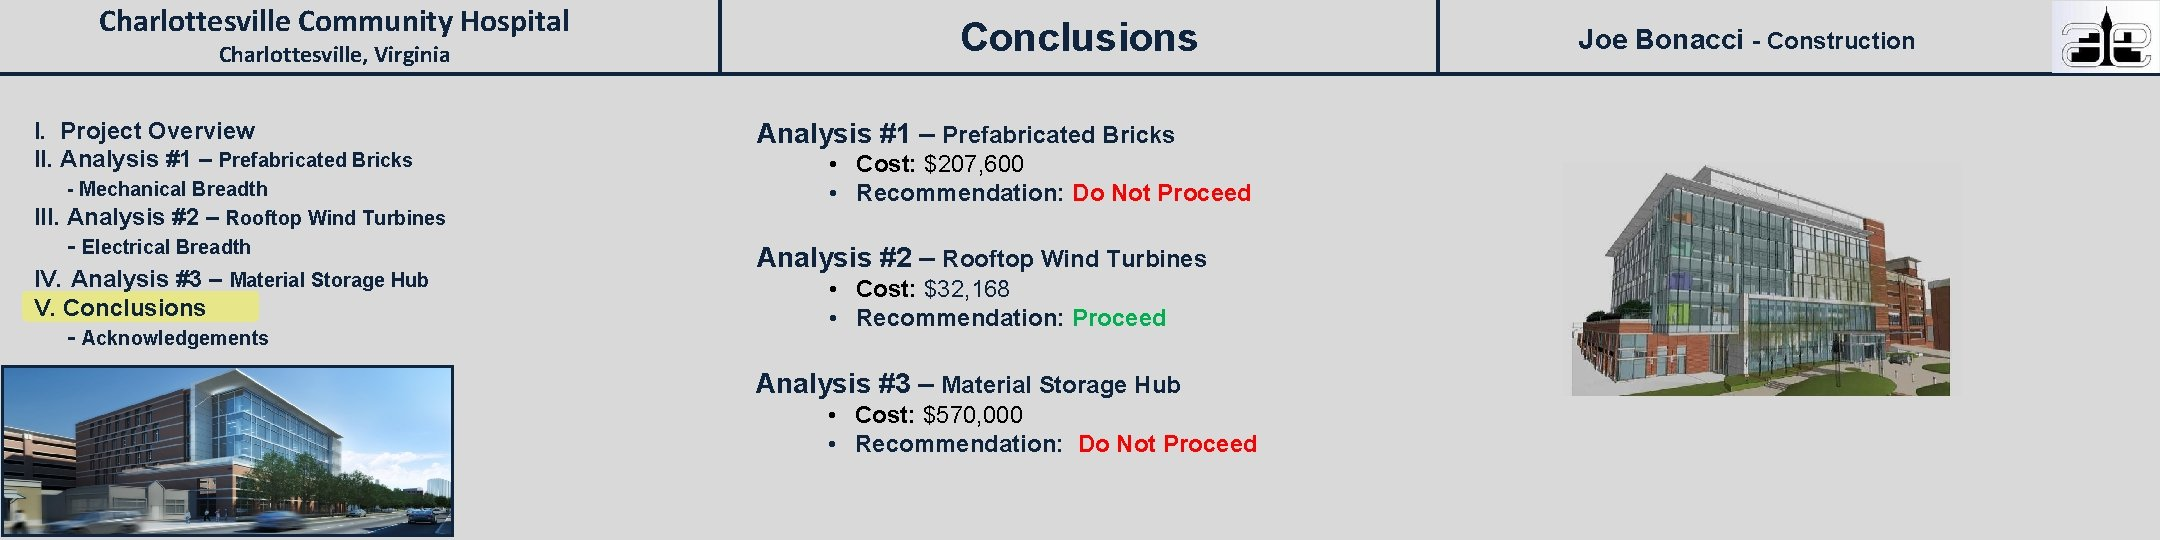 Charlottesville Community Hospital Charlottesville, Virginia I. Project Overview II. Analysis #1 – Prefabricated Bricks